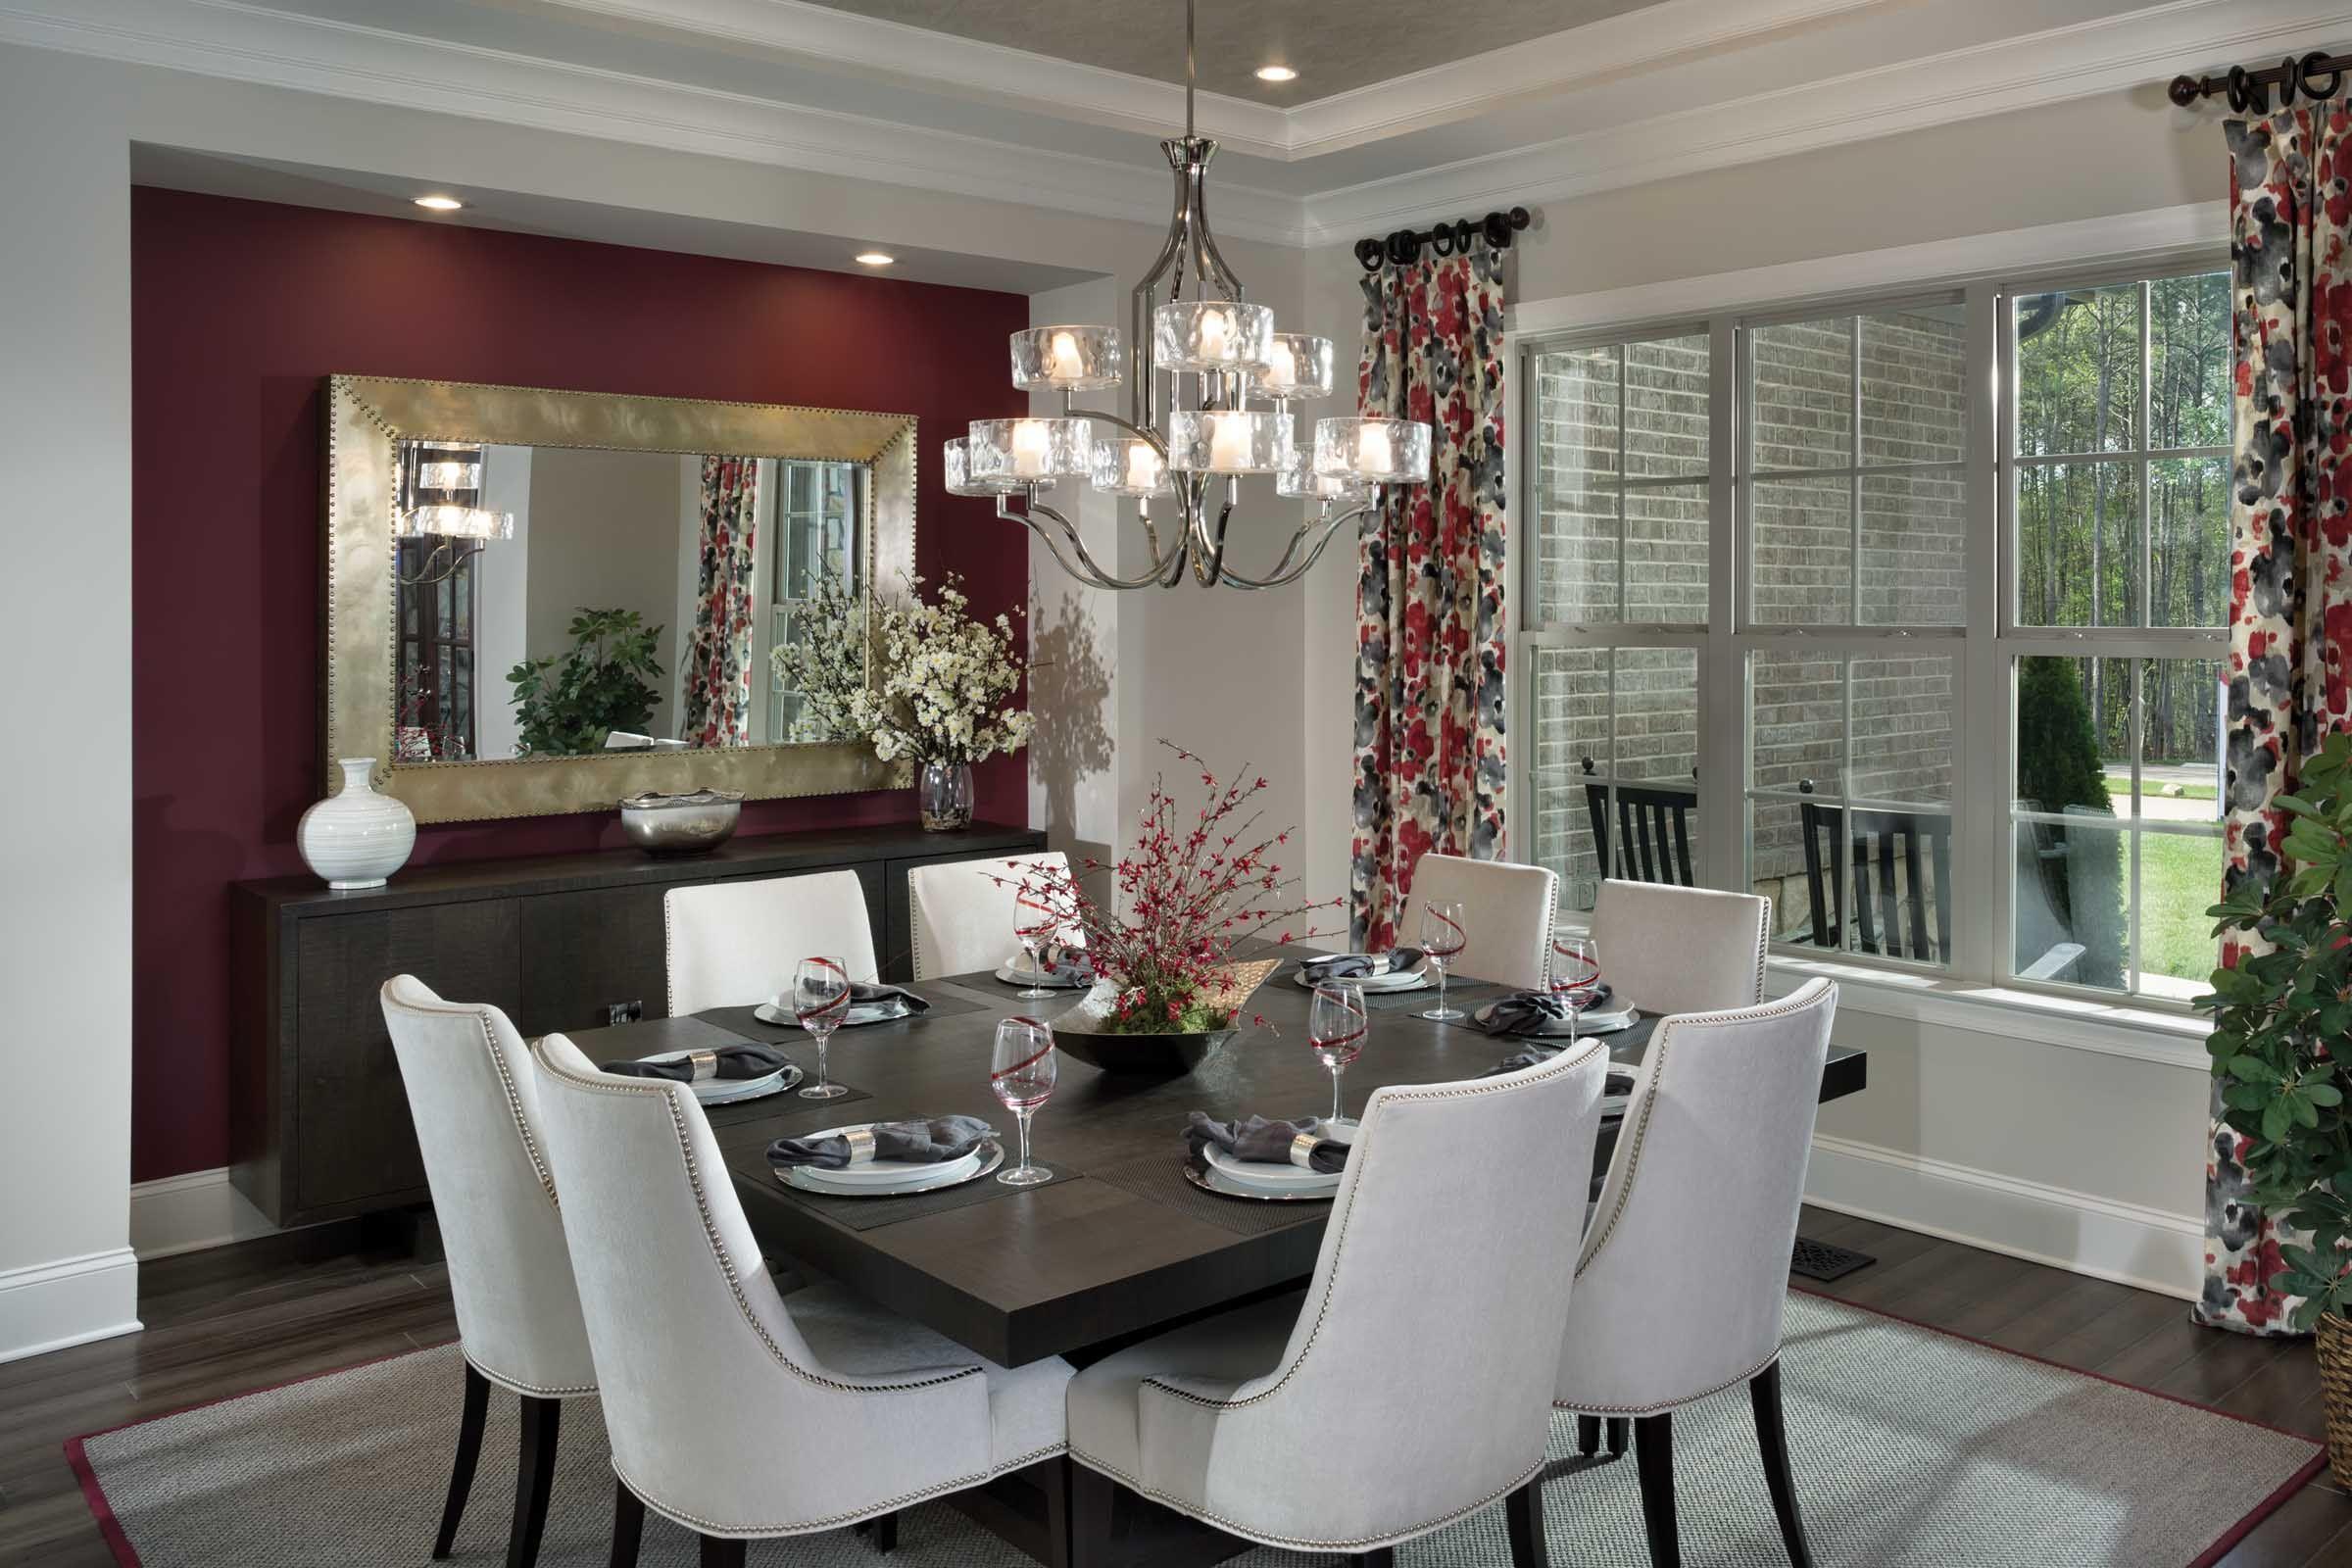 Innovative Dining Room Furniture | Formal dining rooms, Room decor ...